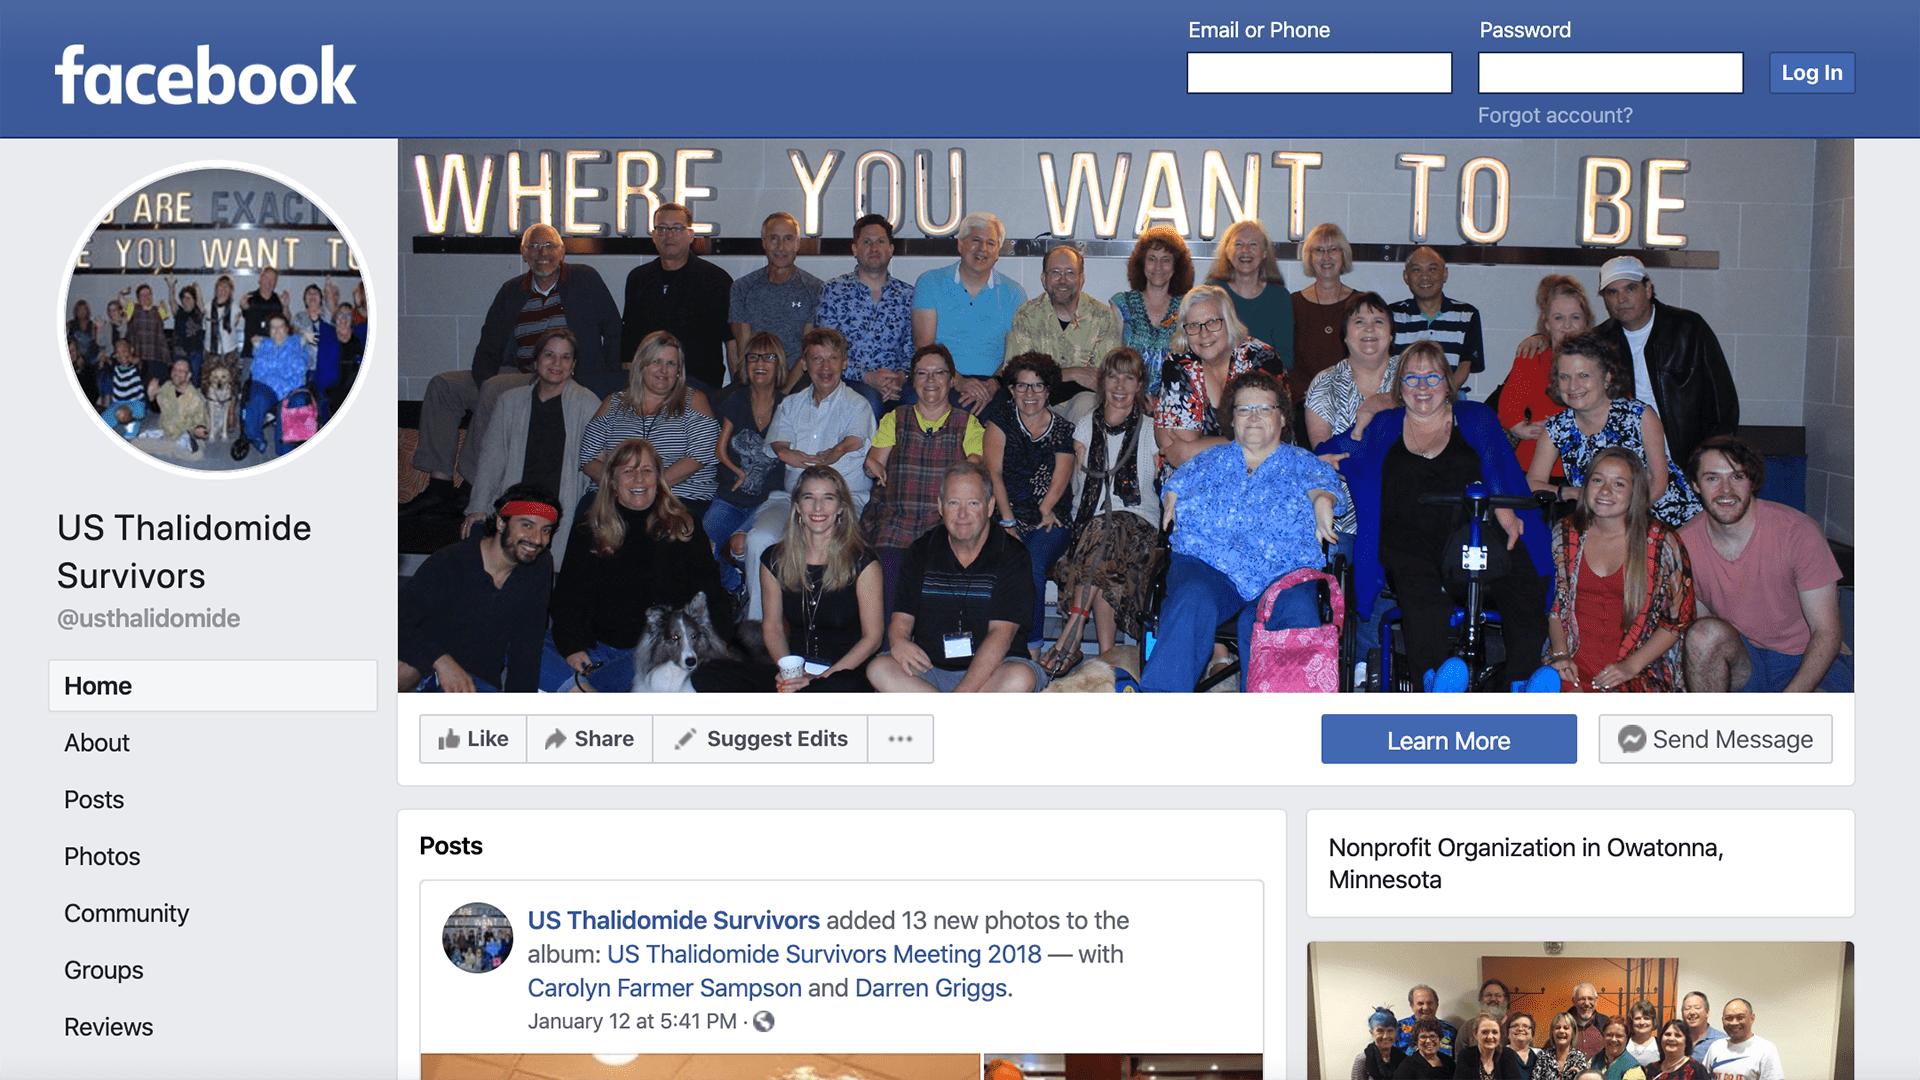 US Thalidomide Survivors Facebook Page